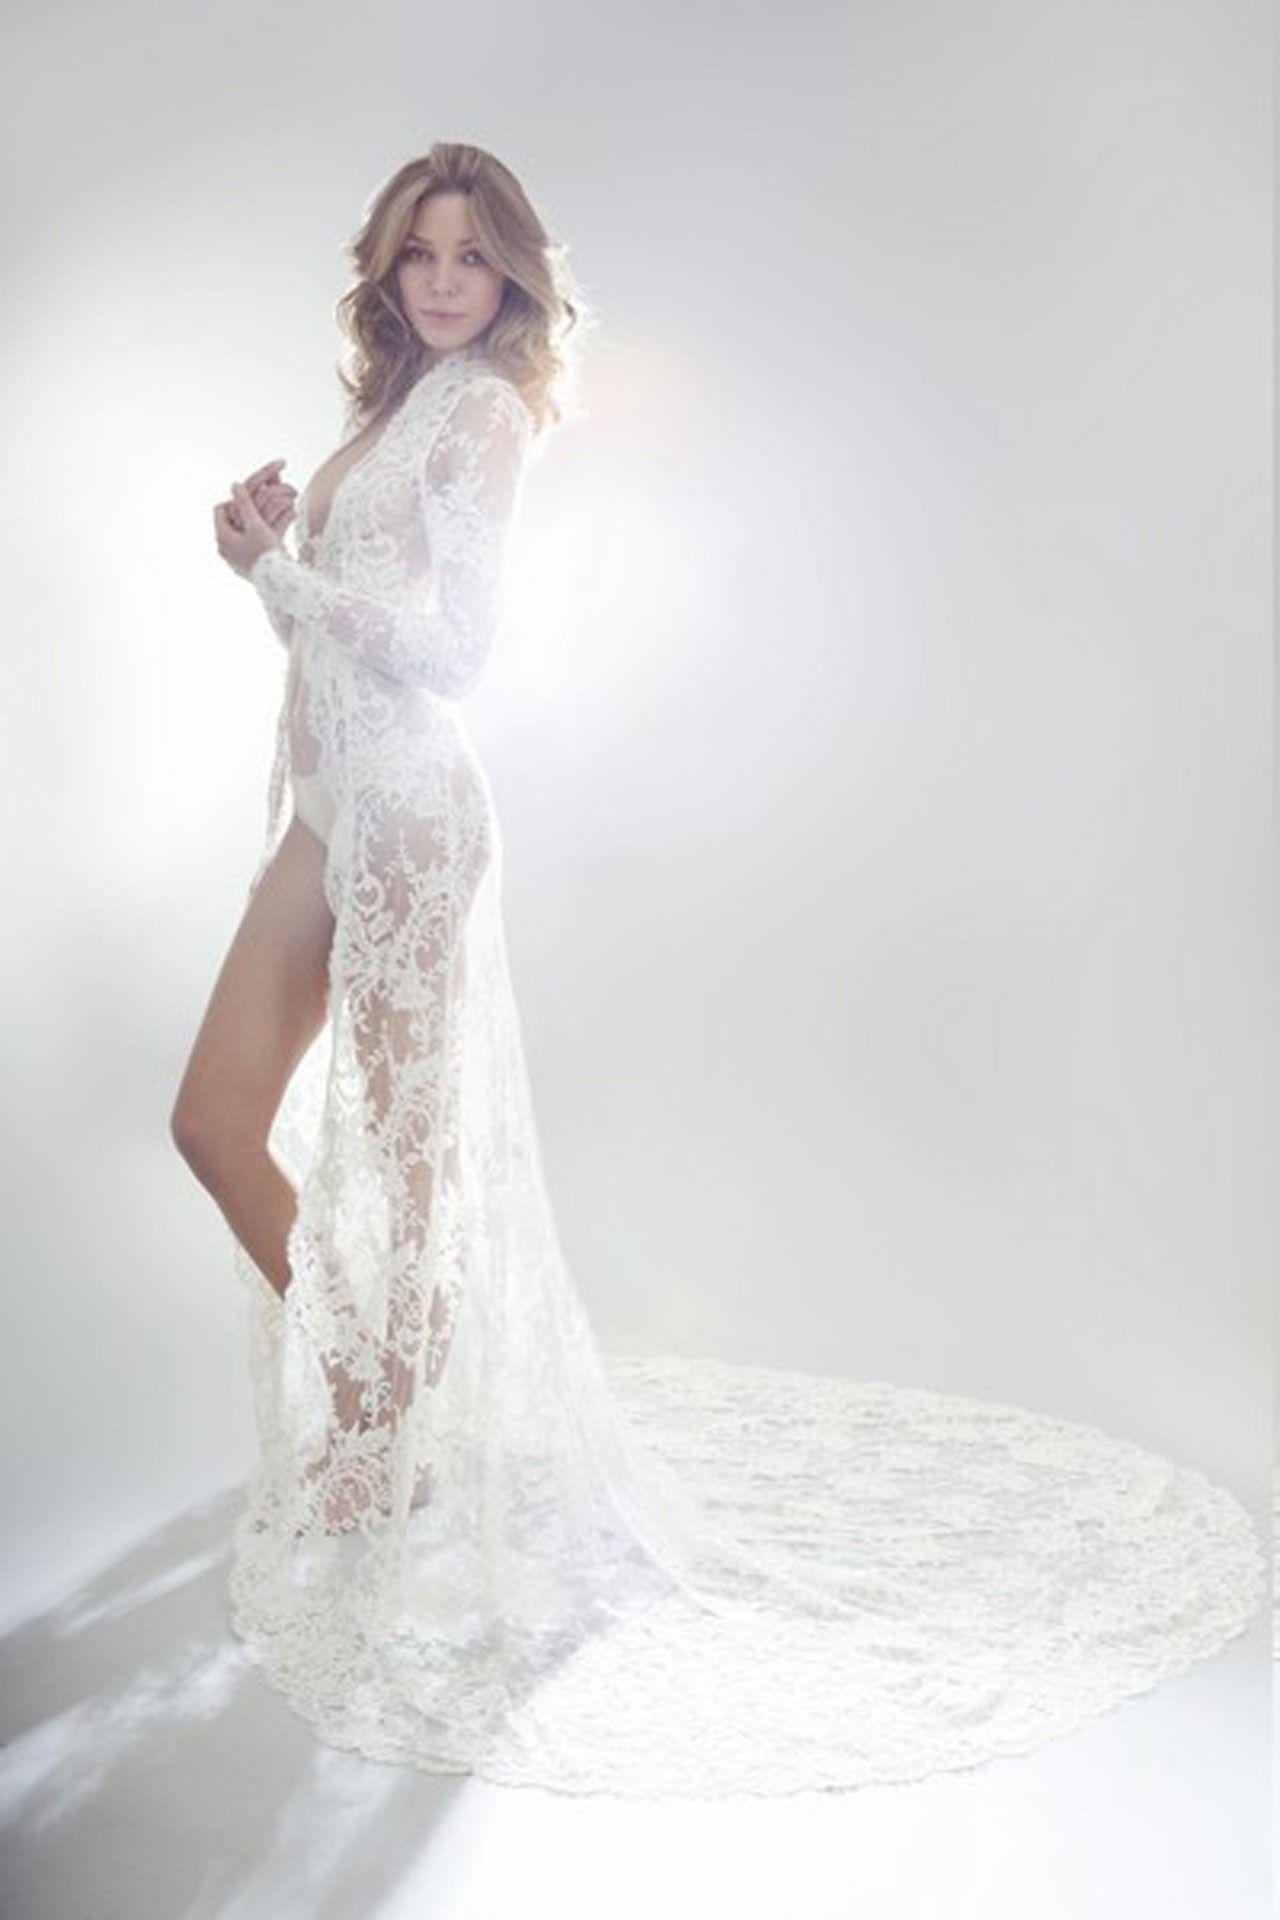 Best Bridal Lingerie - Latest Wedding Underwear (BridesMagazine.co ...